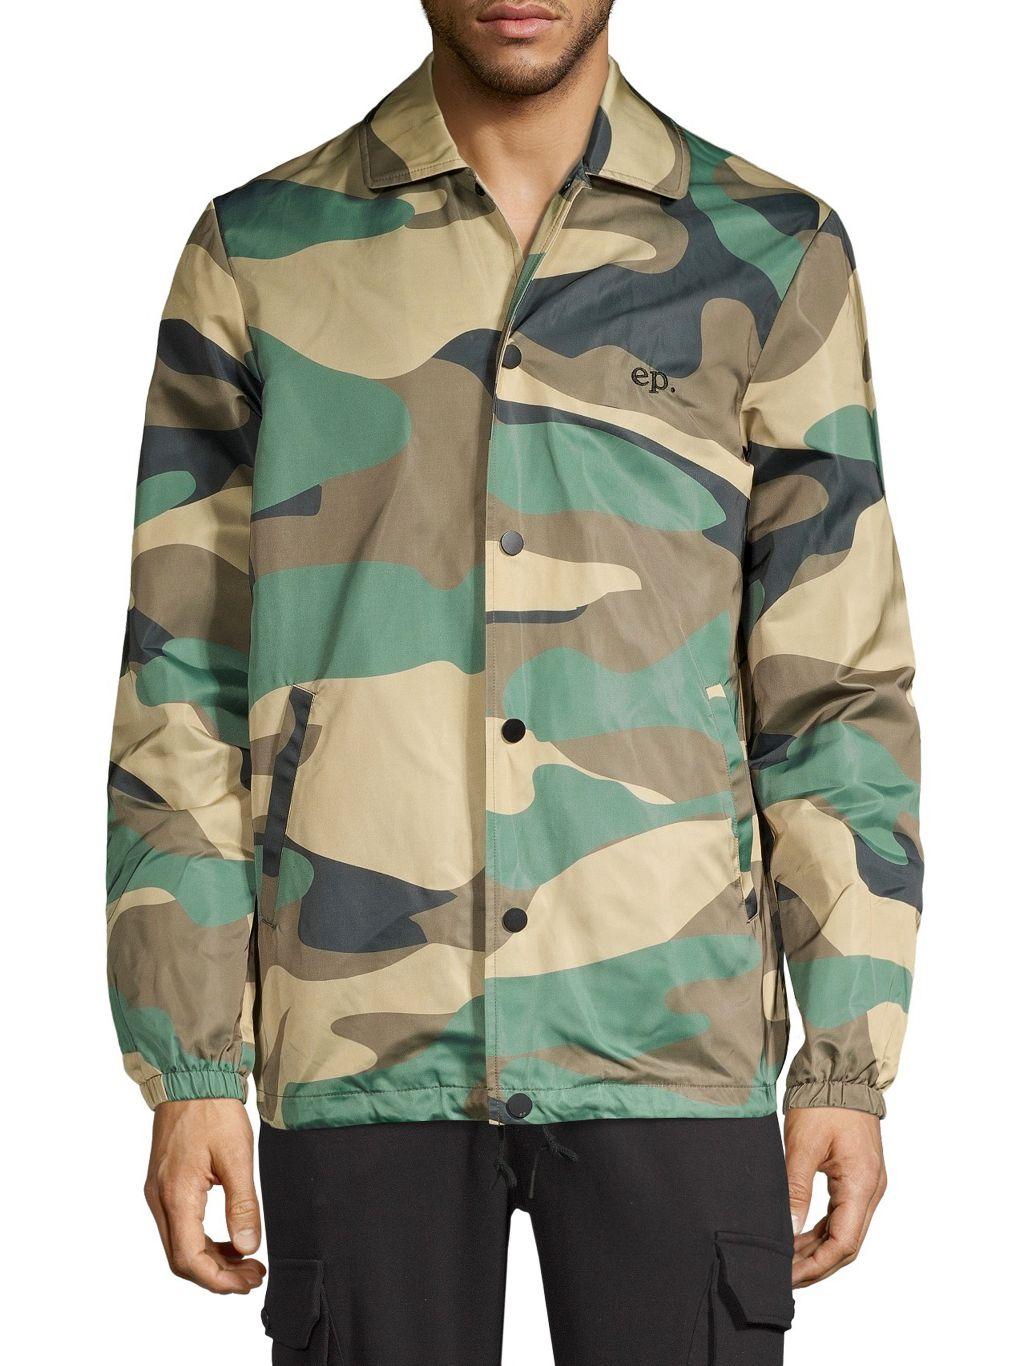 Eleven Paris Madrague Camo Jacket